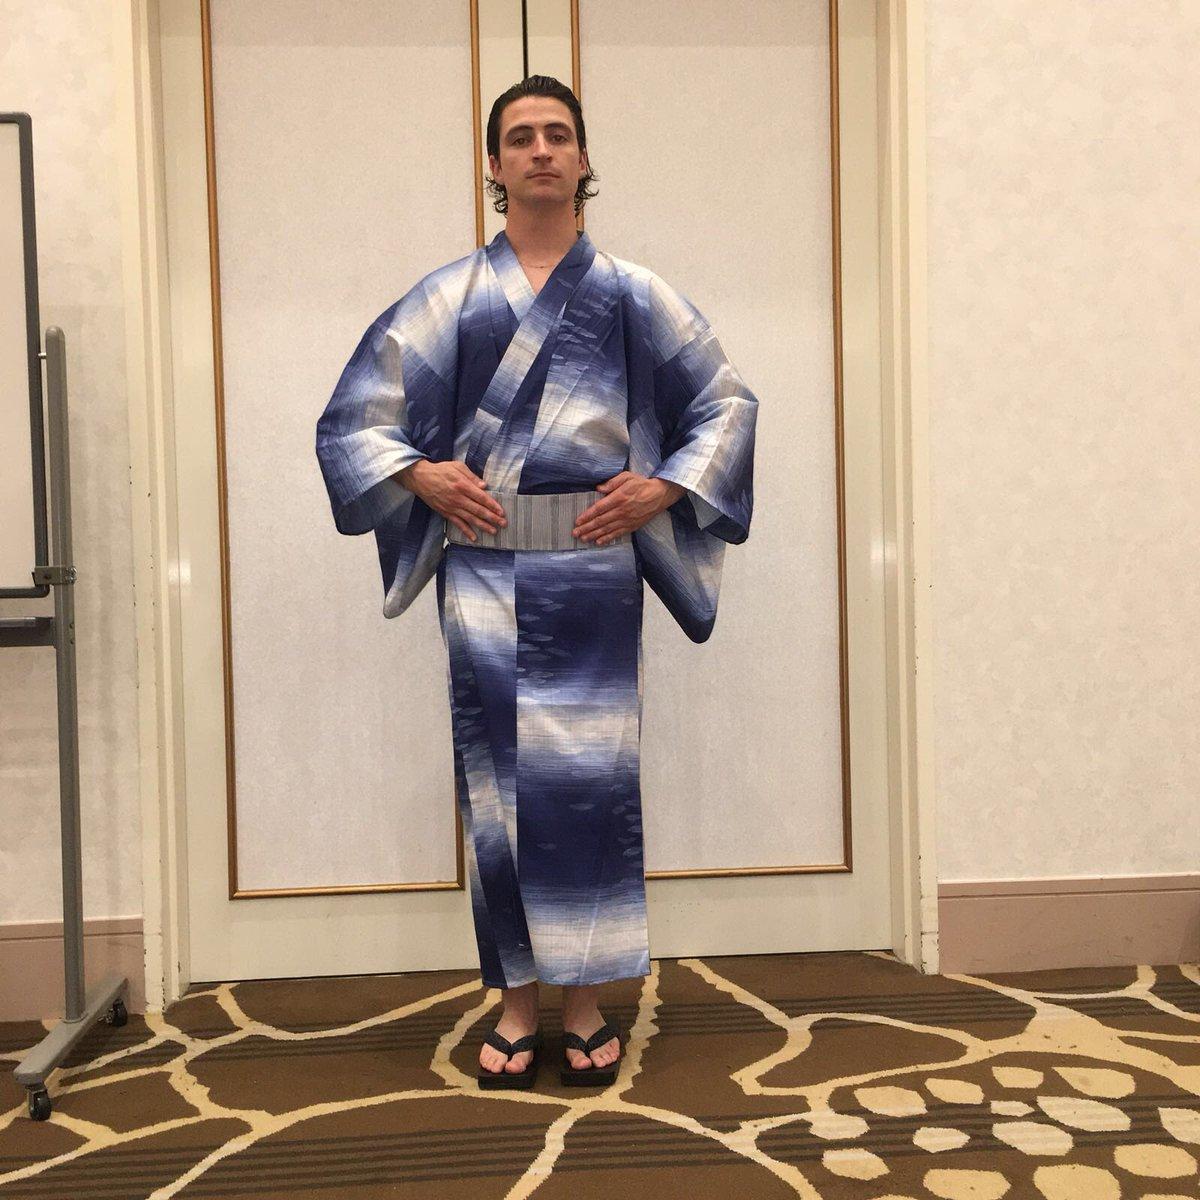 Scott Moir On Twitter Japan Trip Complete What A Blast Momma I M